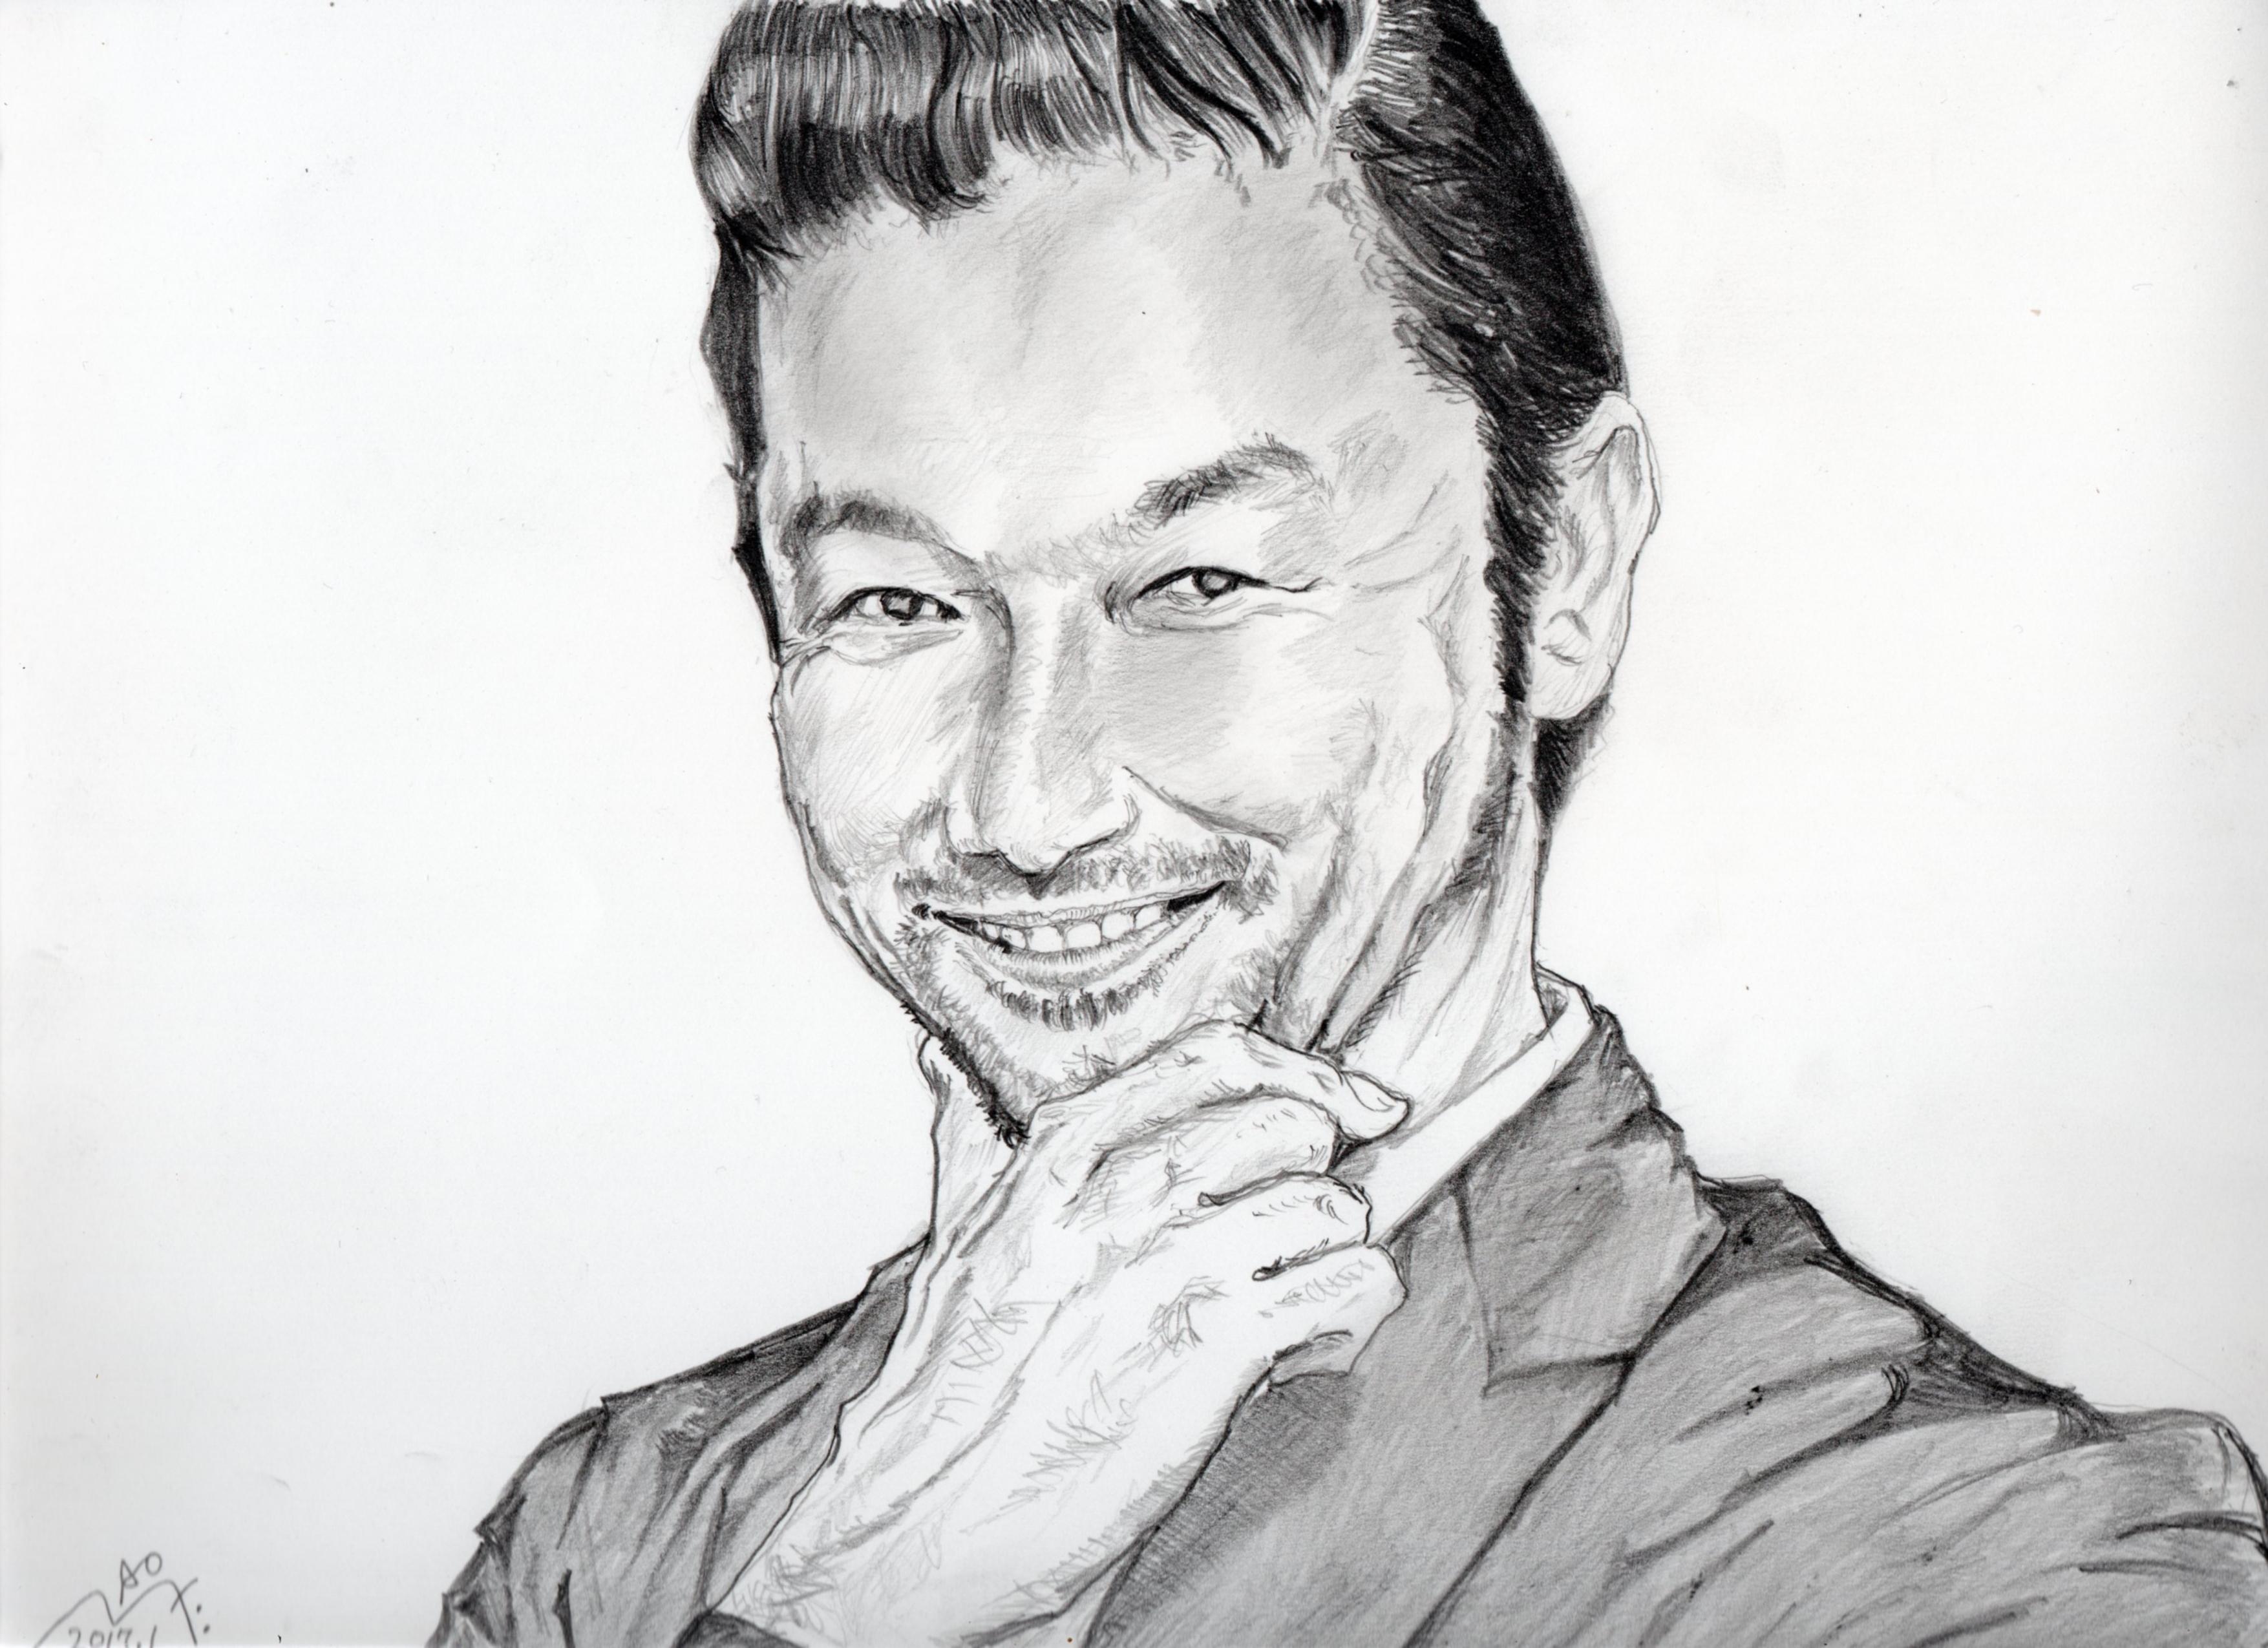 浅野忠信の鉛筆画似顔絵